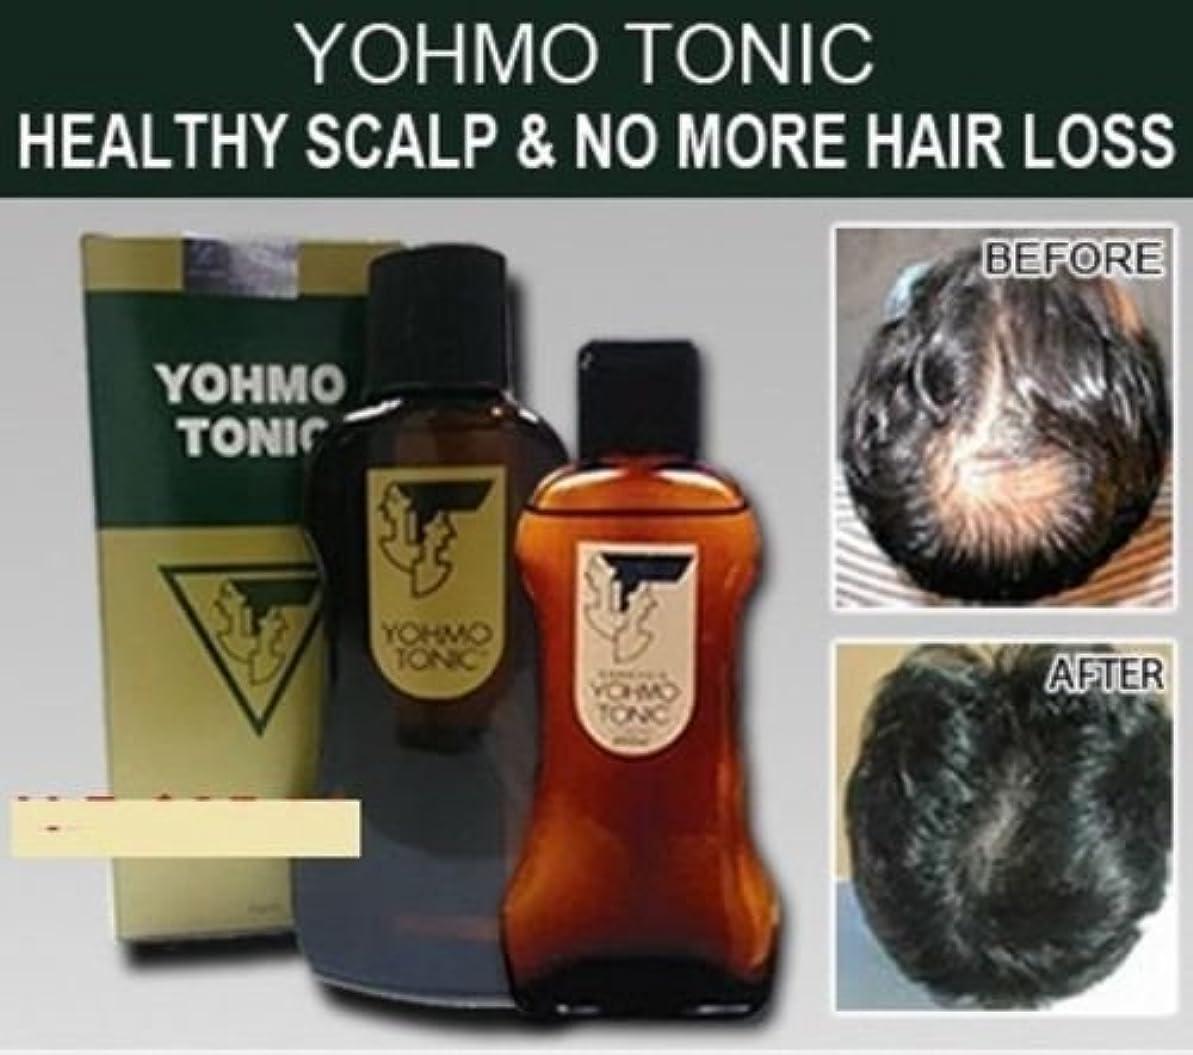 鎮静剤論理的に虚弱YOHMO 強壮剤200ml 使用する育毛剤外部日本脱毛強壮剤